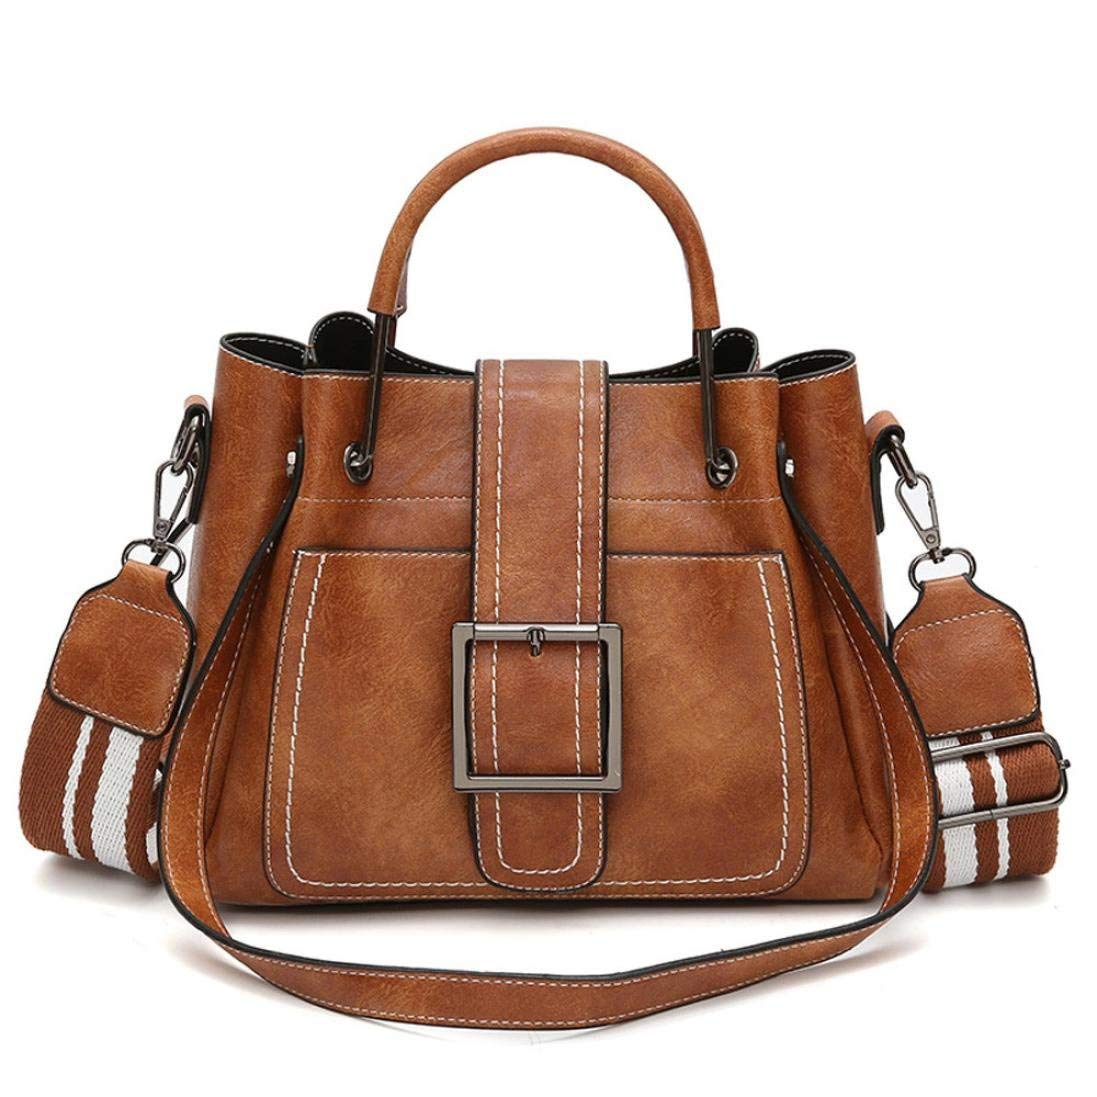 Women Retro Shoulder Corssbody Bag Faux Leather Work Handbag Formal Occasions Satchel Totes Bags